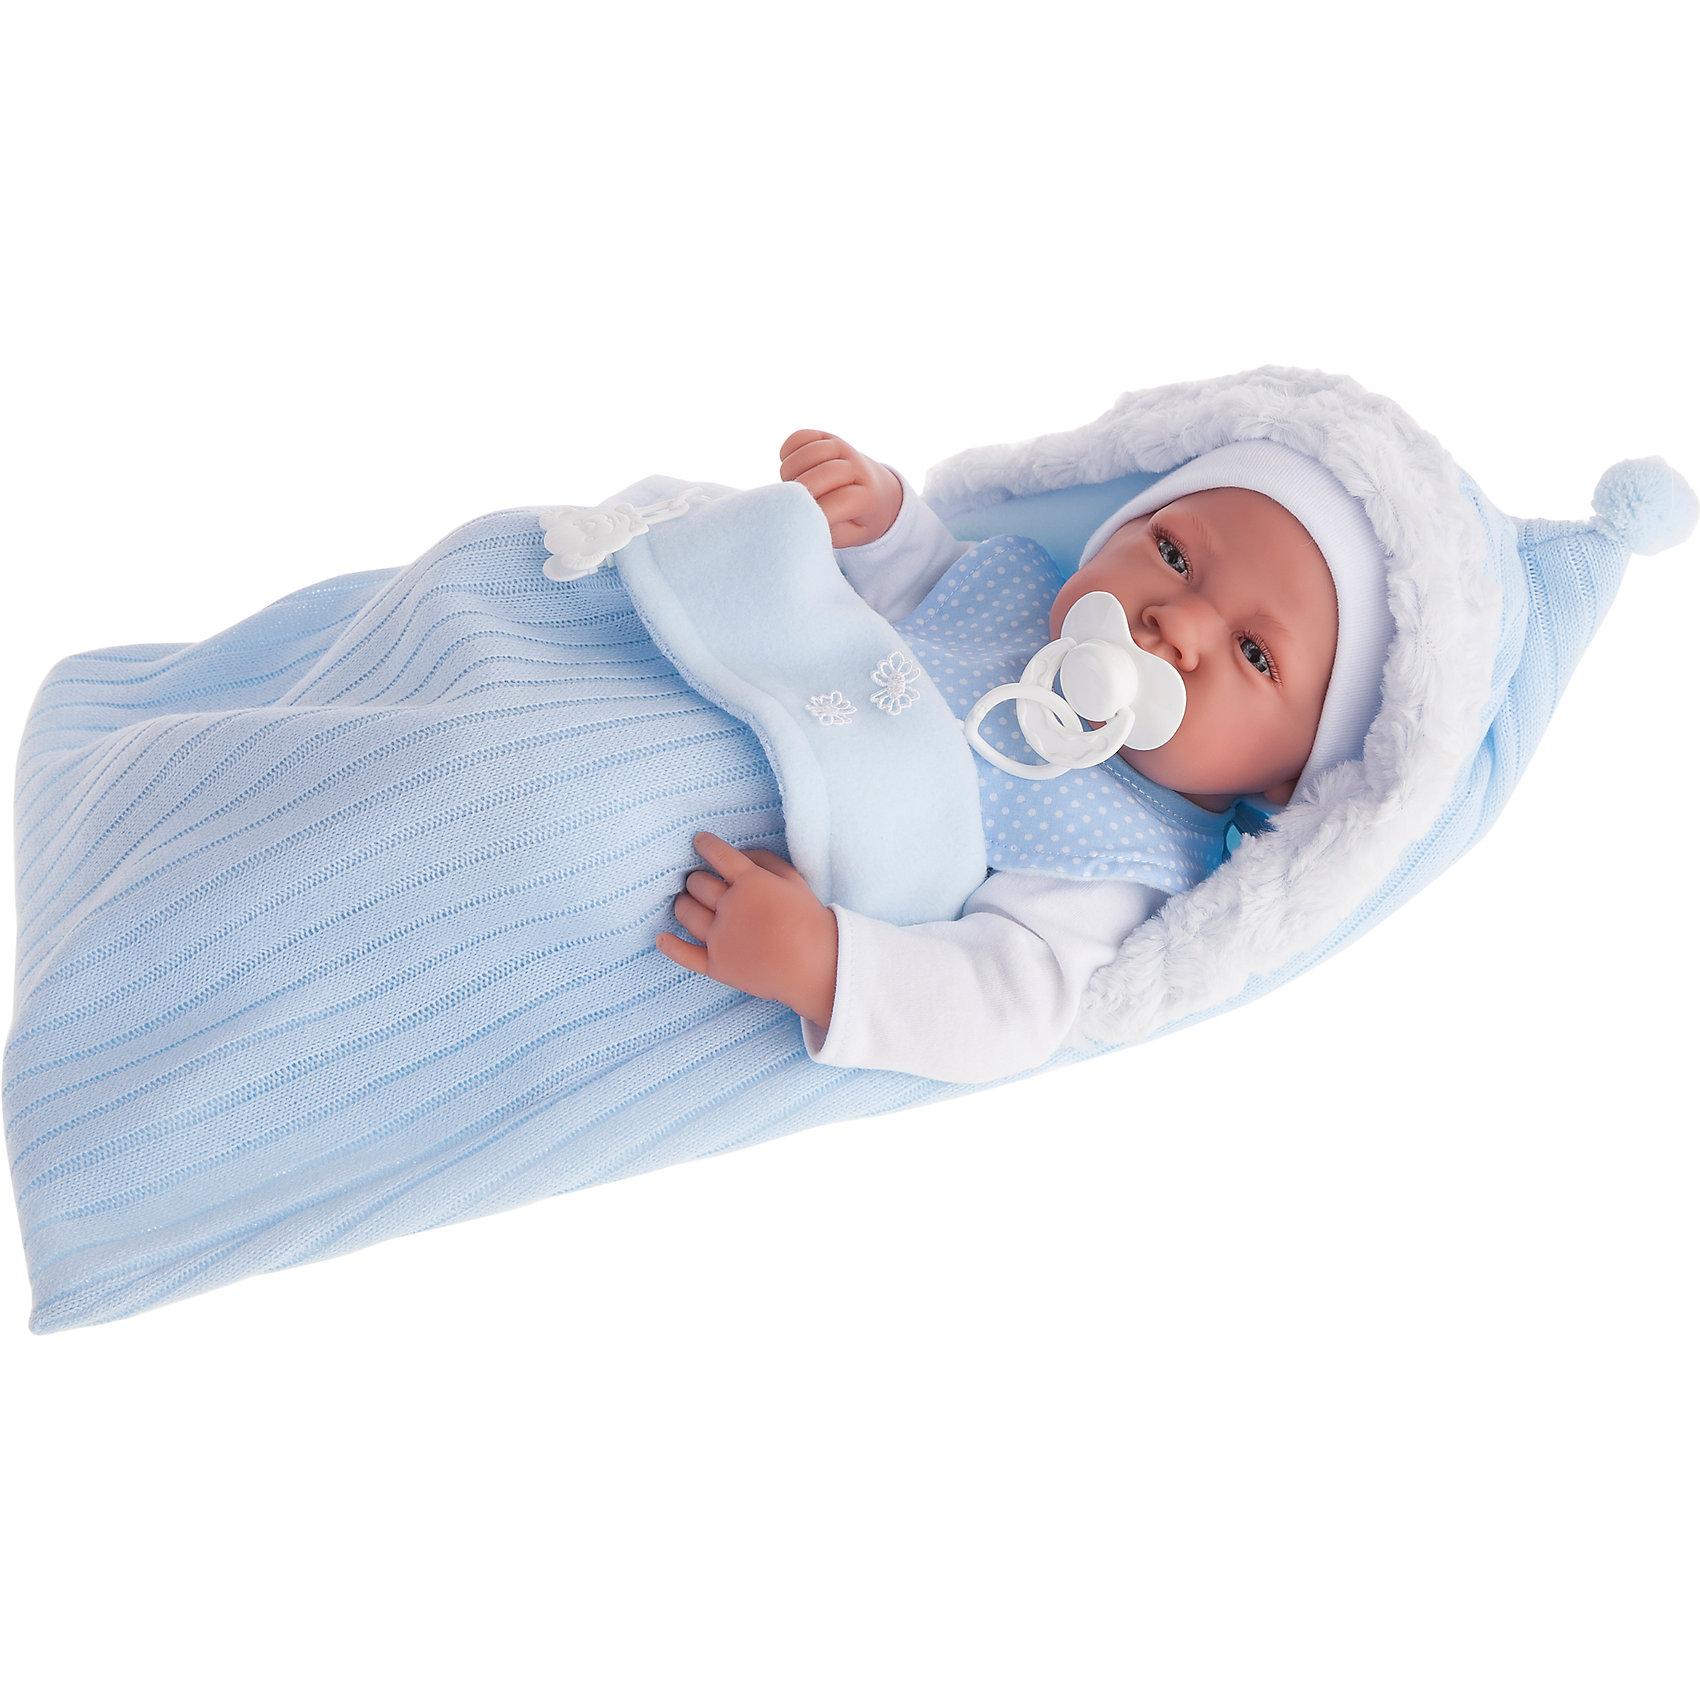 Munecas Antonio Juan Кукла-младенец Хьюго, 42 см, Munecas Antonio Juan кукла младенец игнасио в голубом 42 см antonio juan munecas